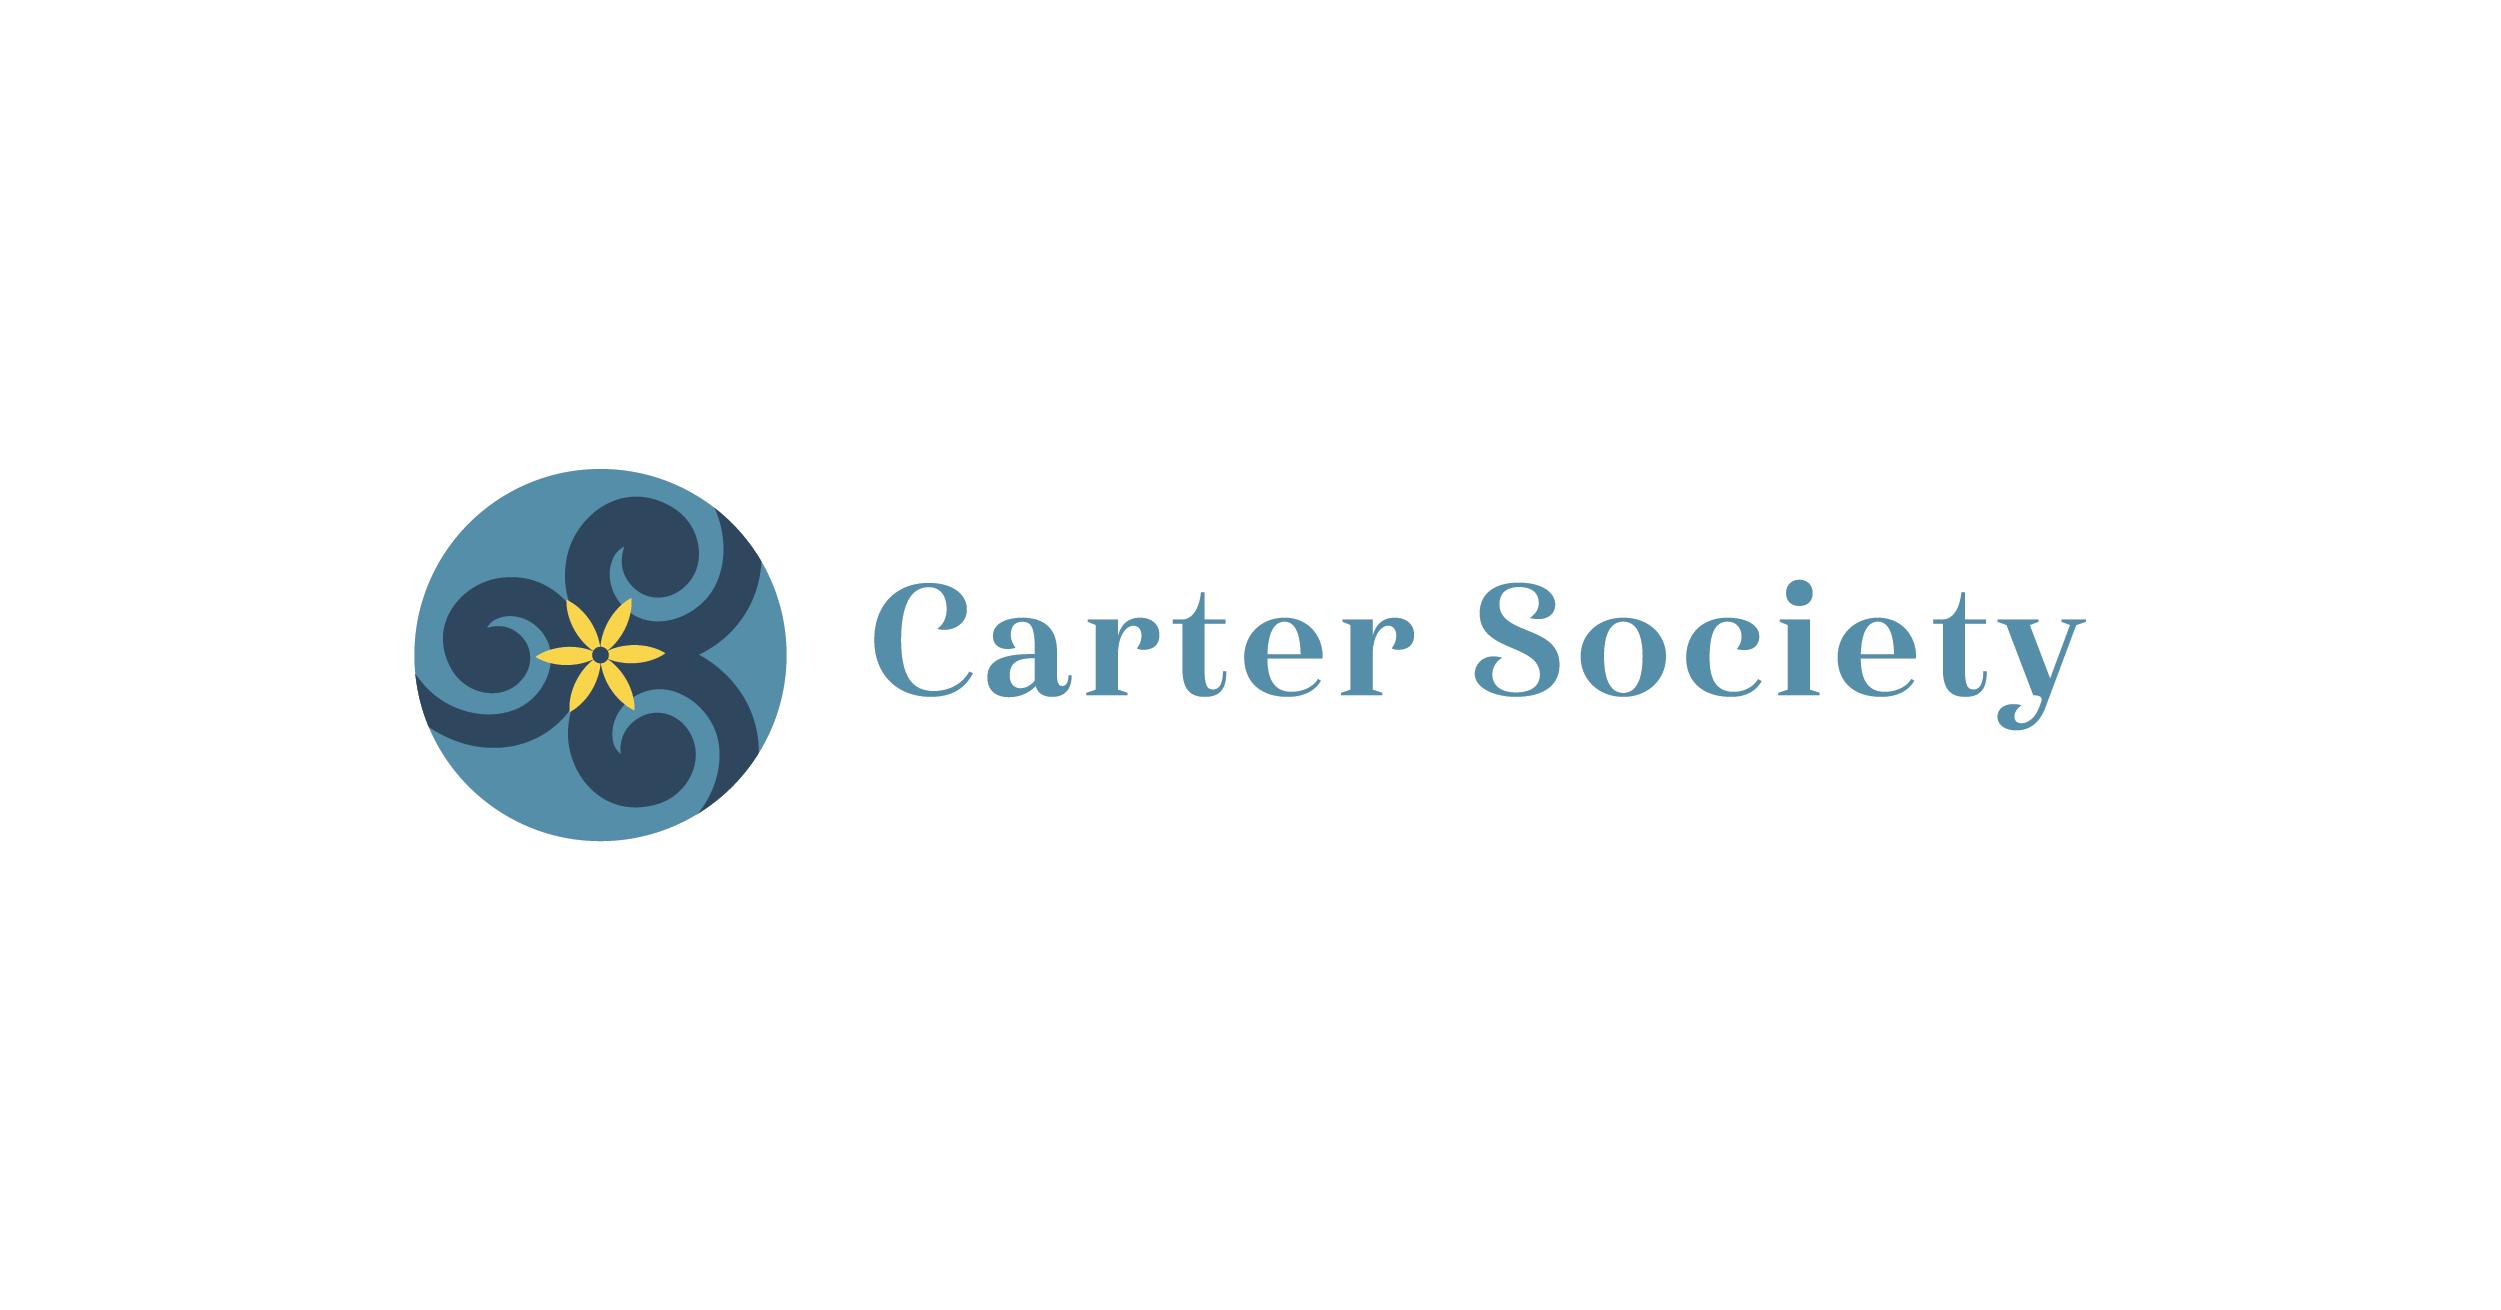 Carter Society Logo 4